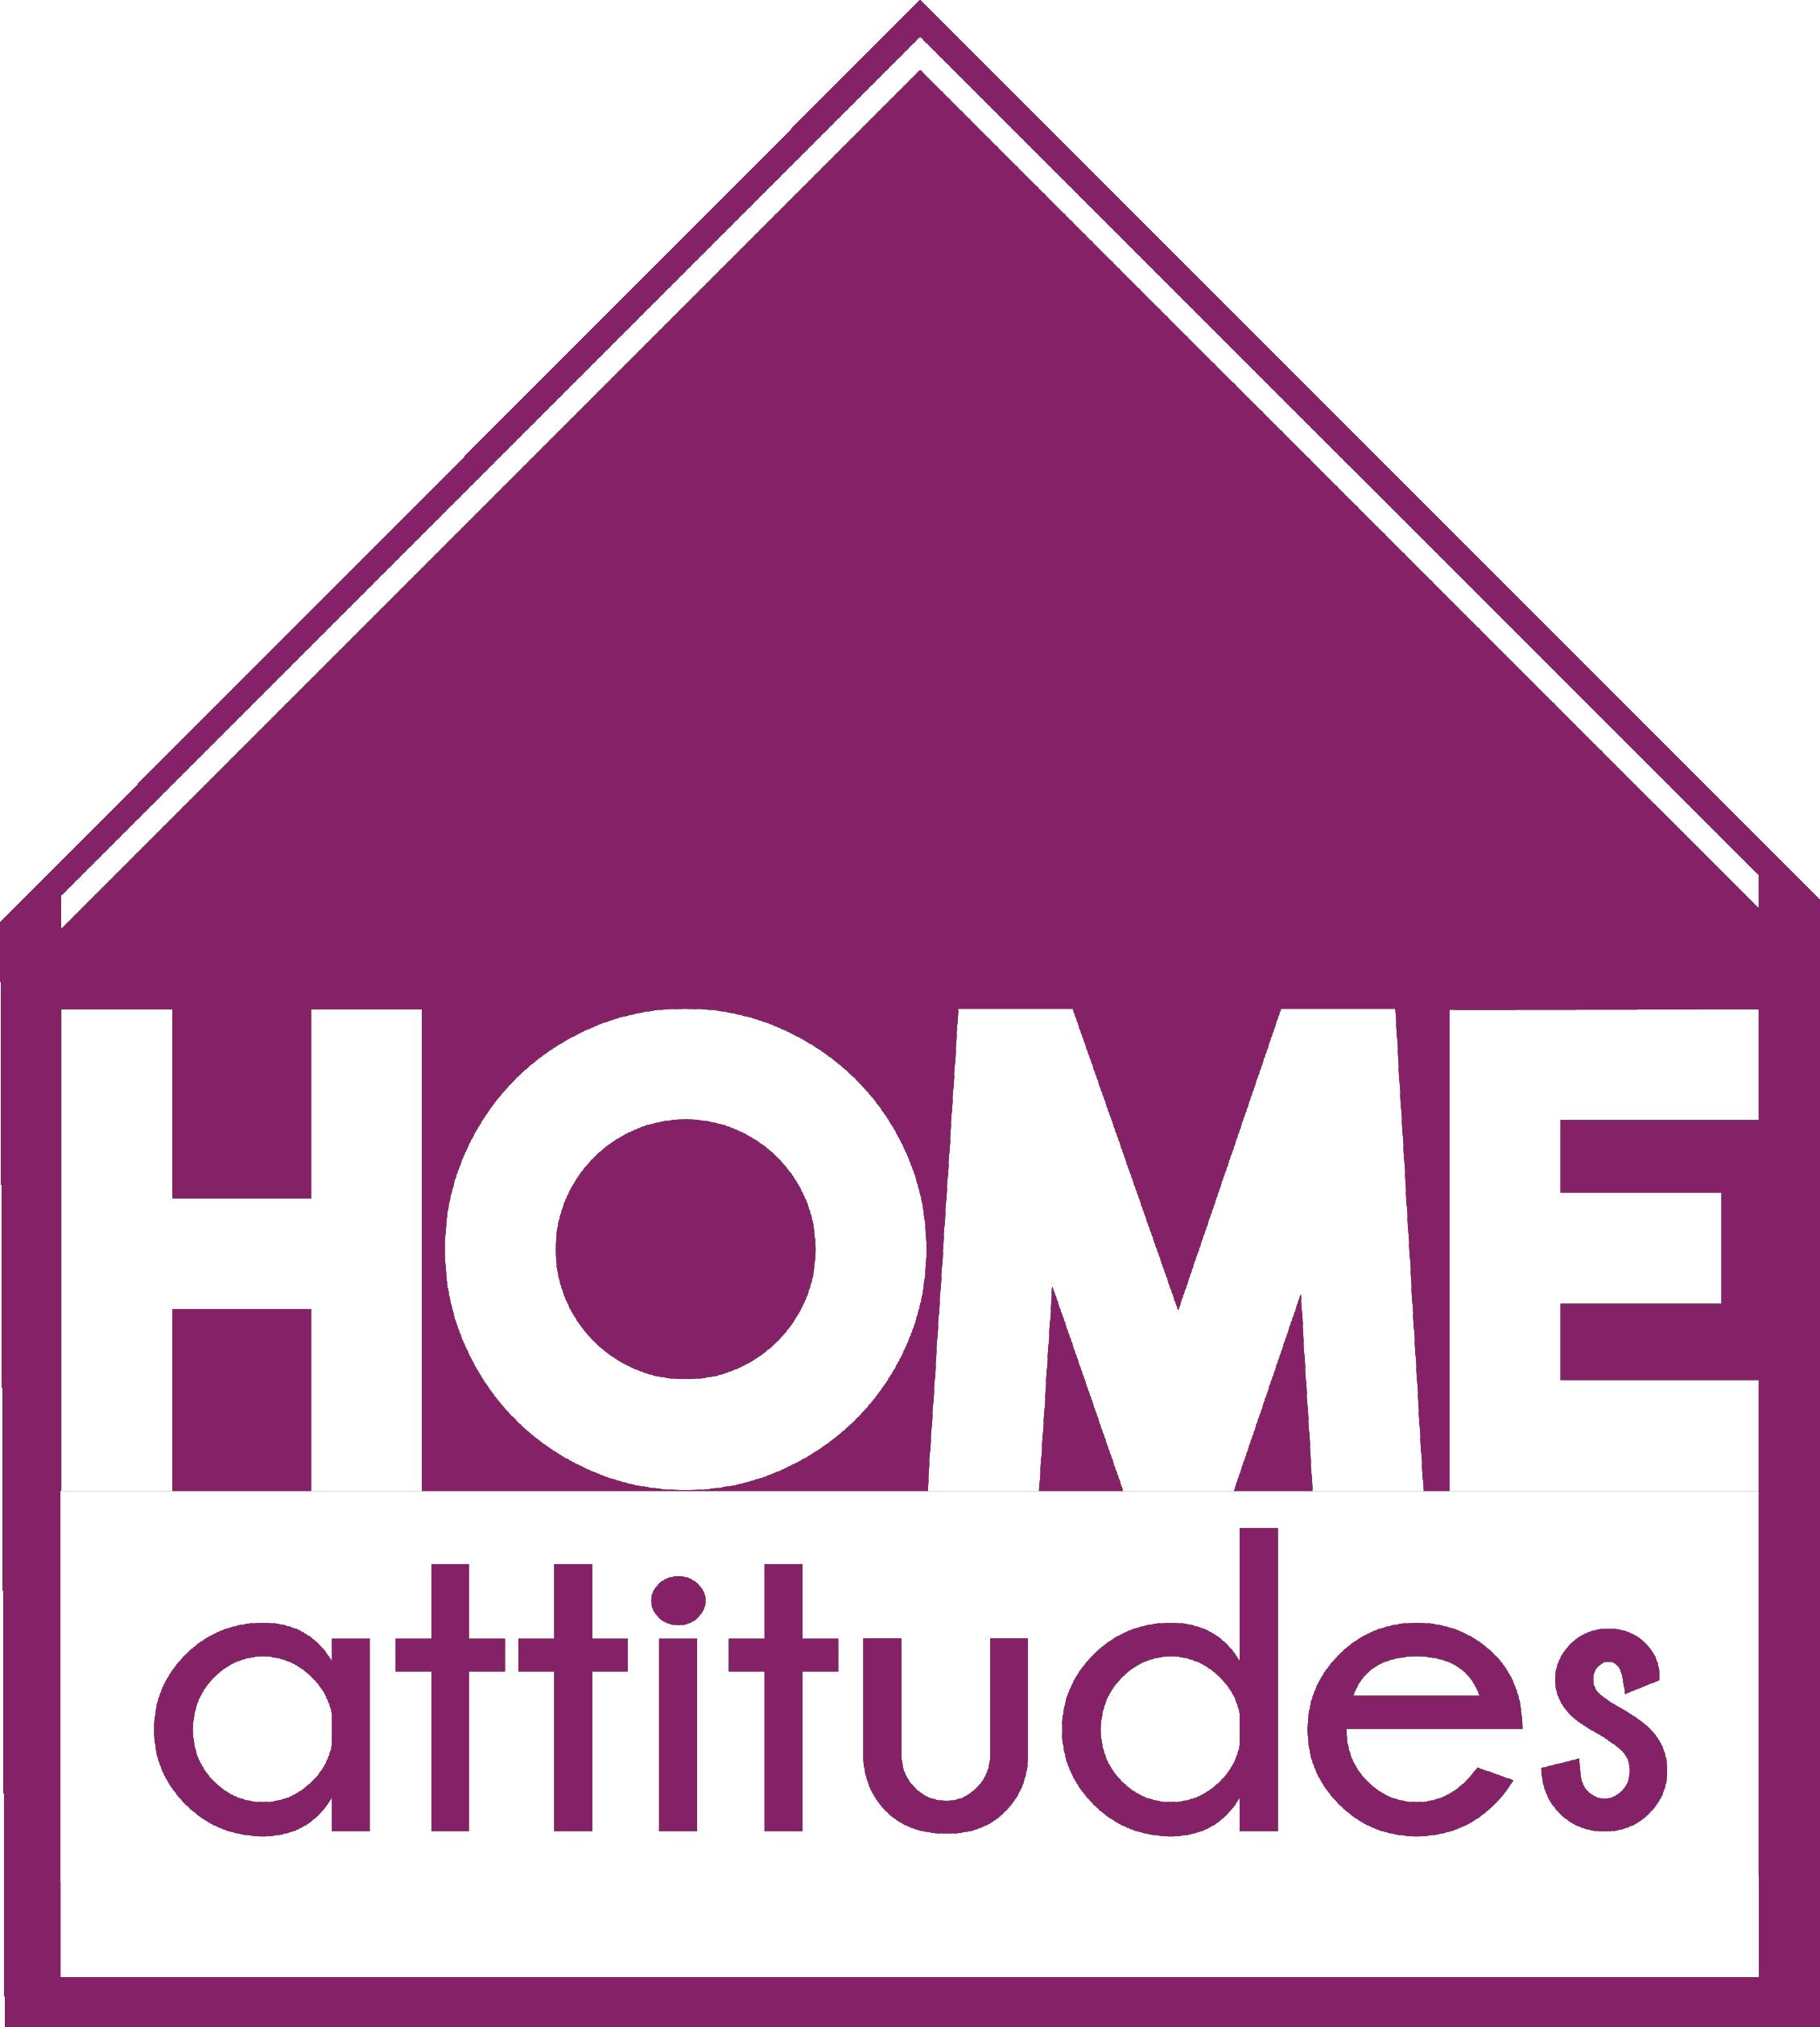 Home Attitudes